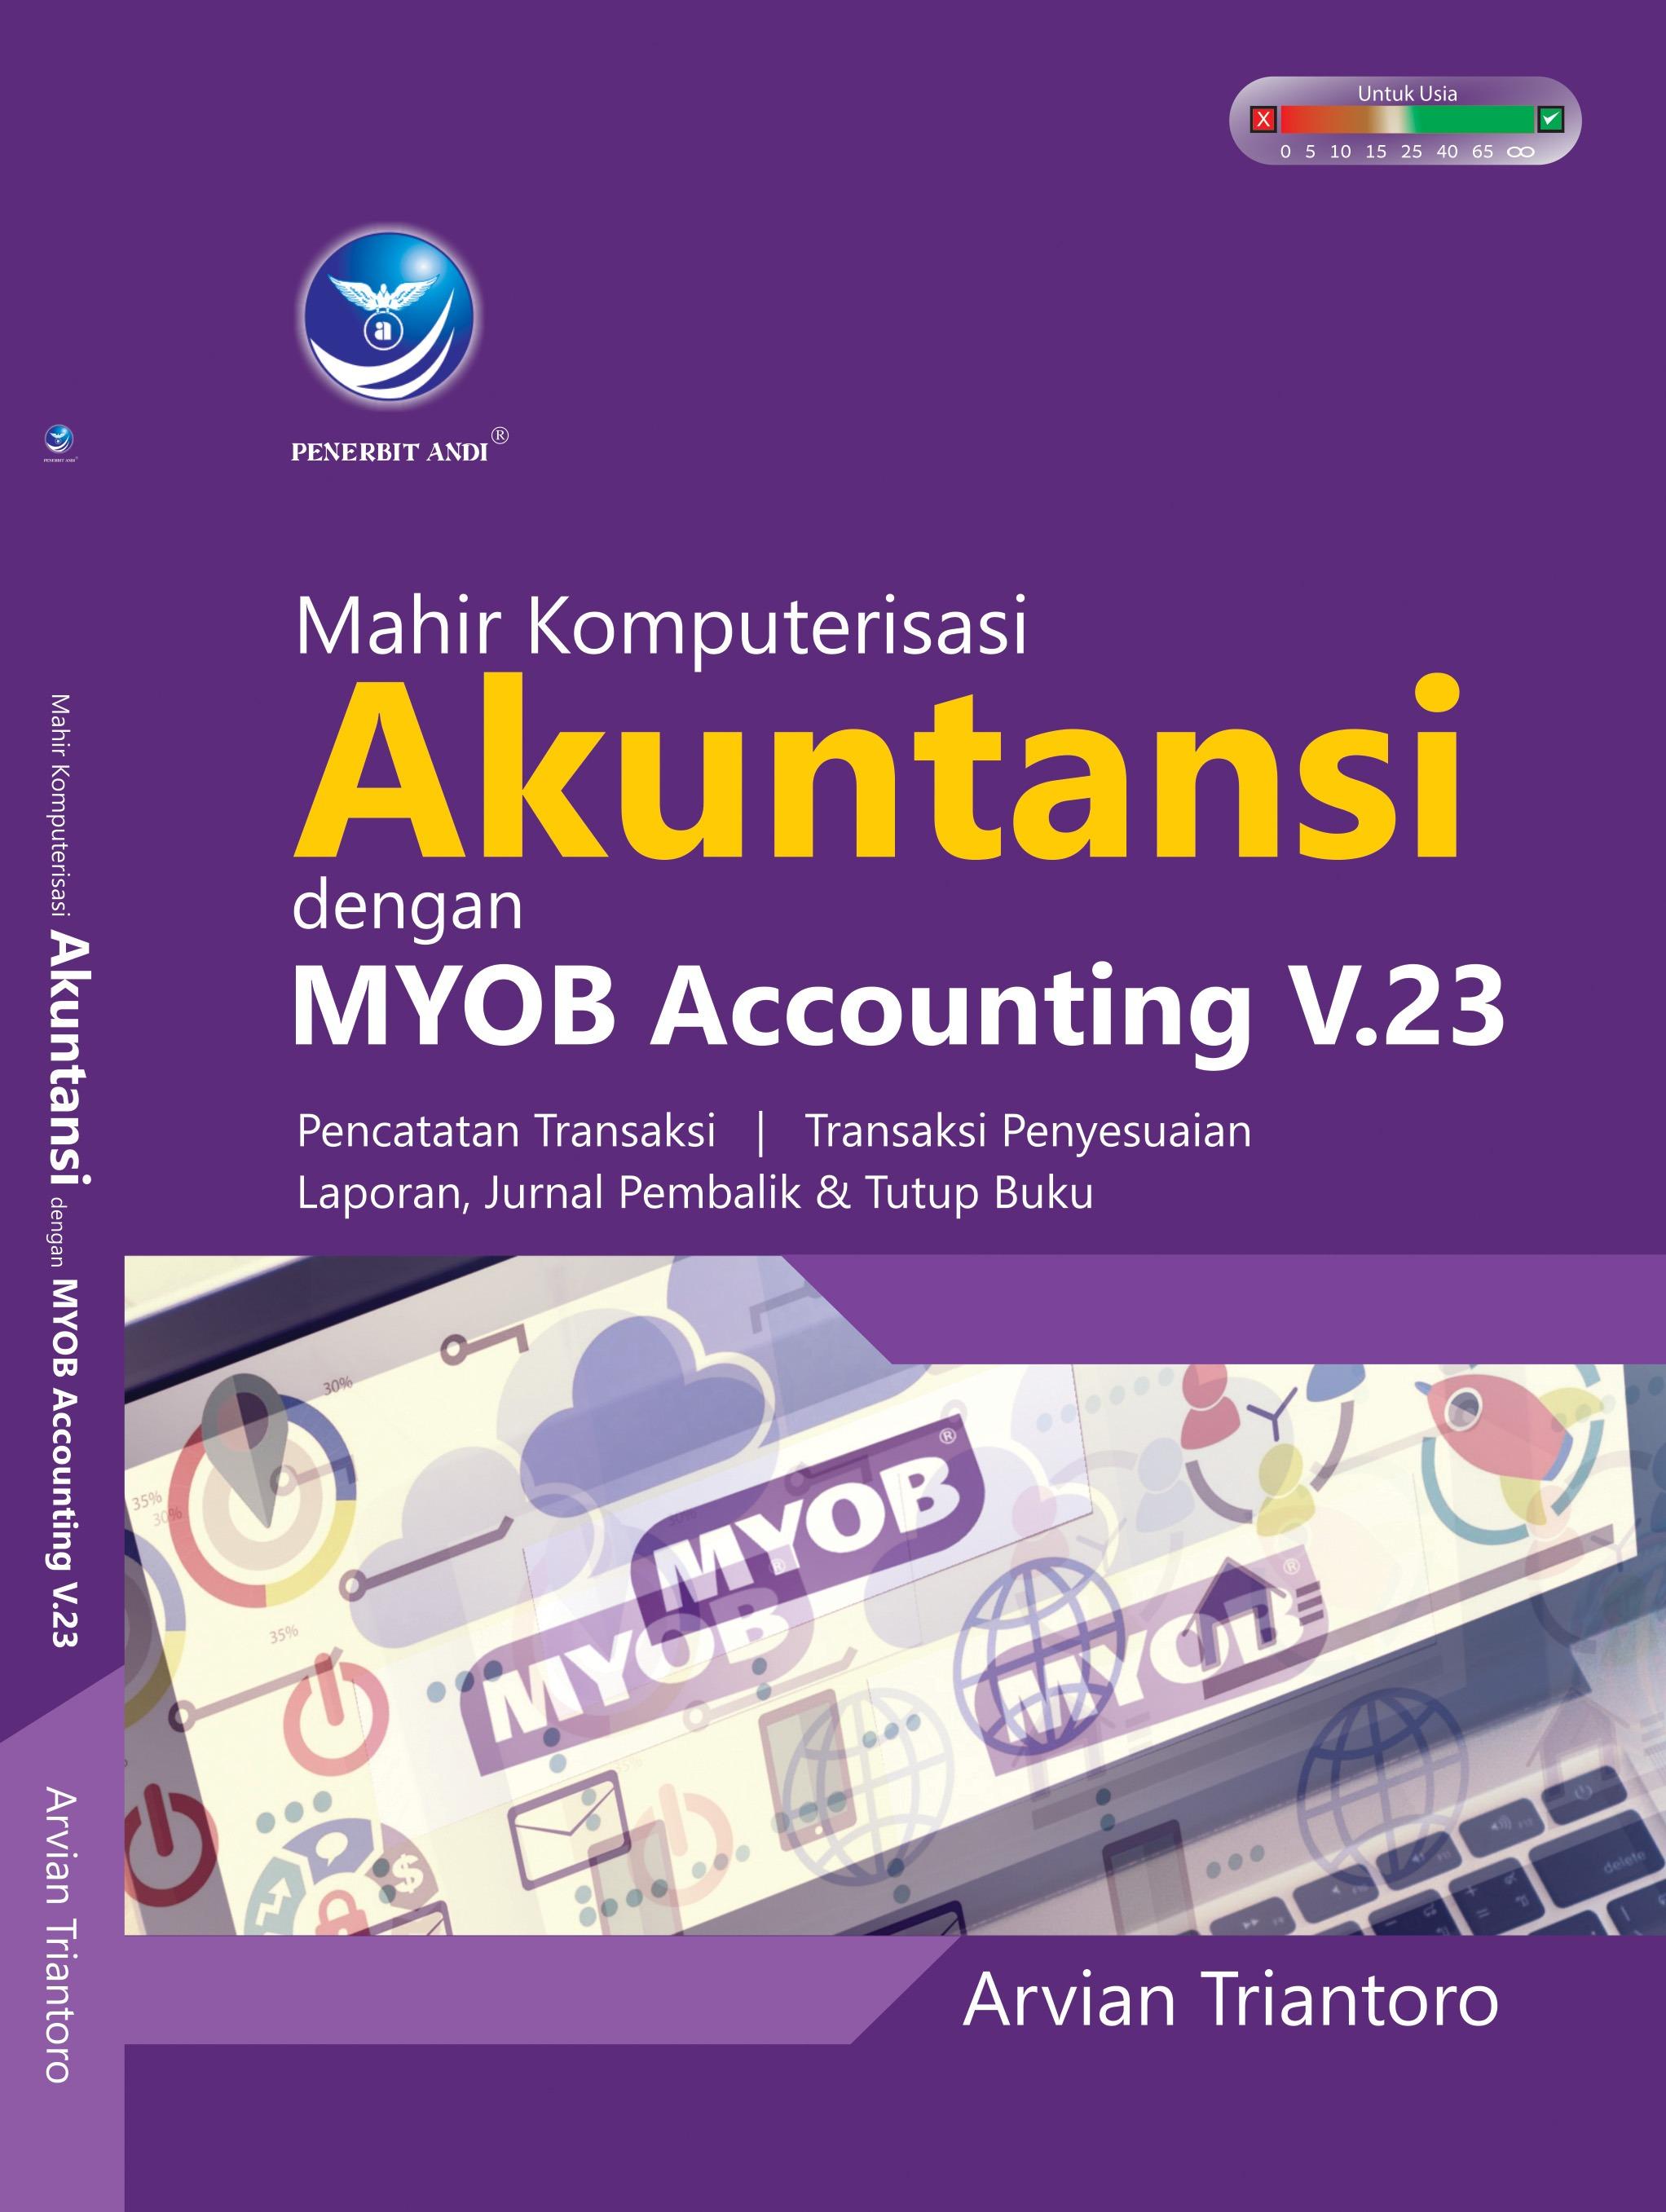 Mahir Komputerisasi Akuntansi Dengan MYOB Accounting V.23